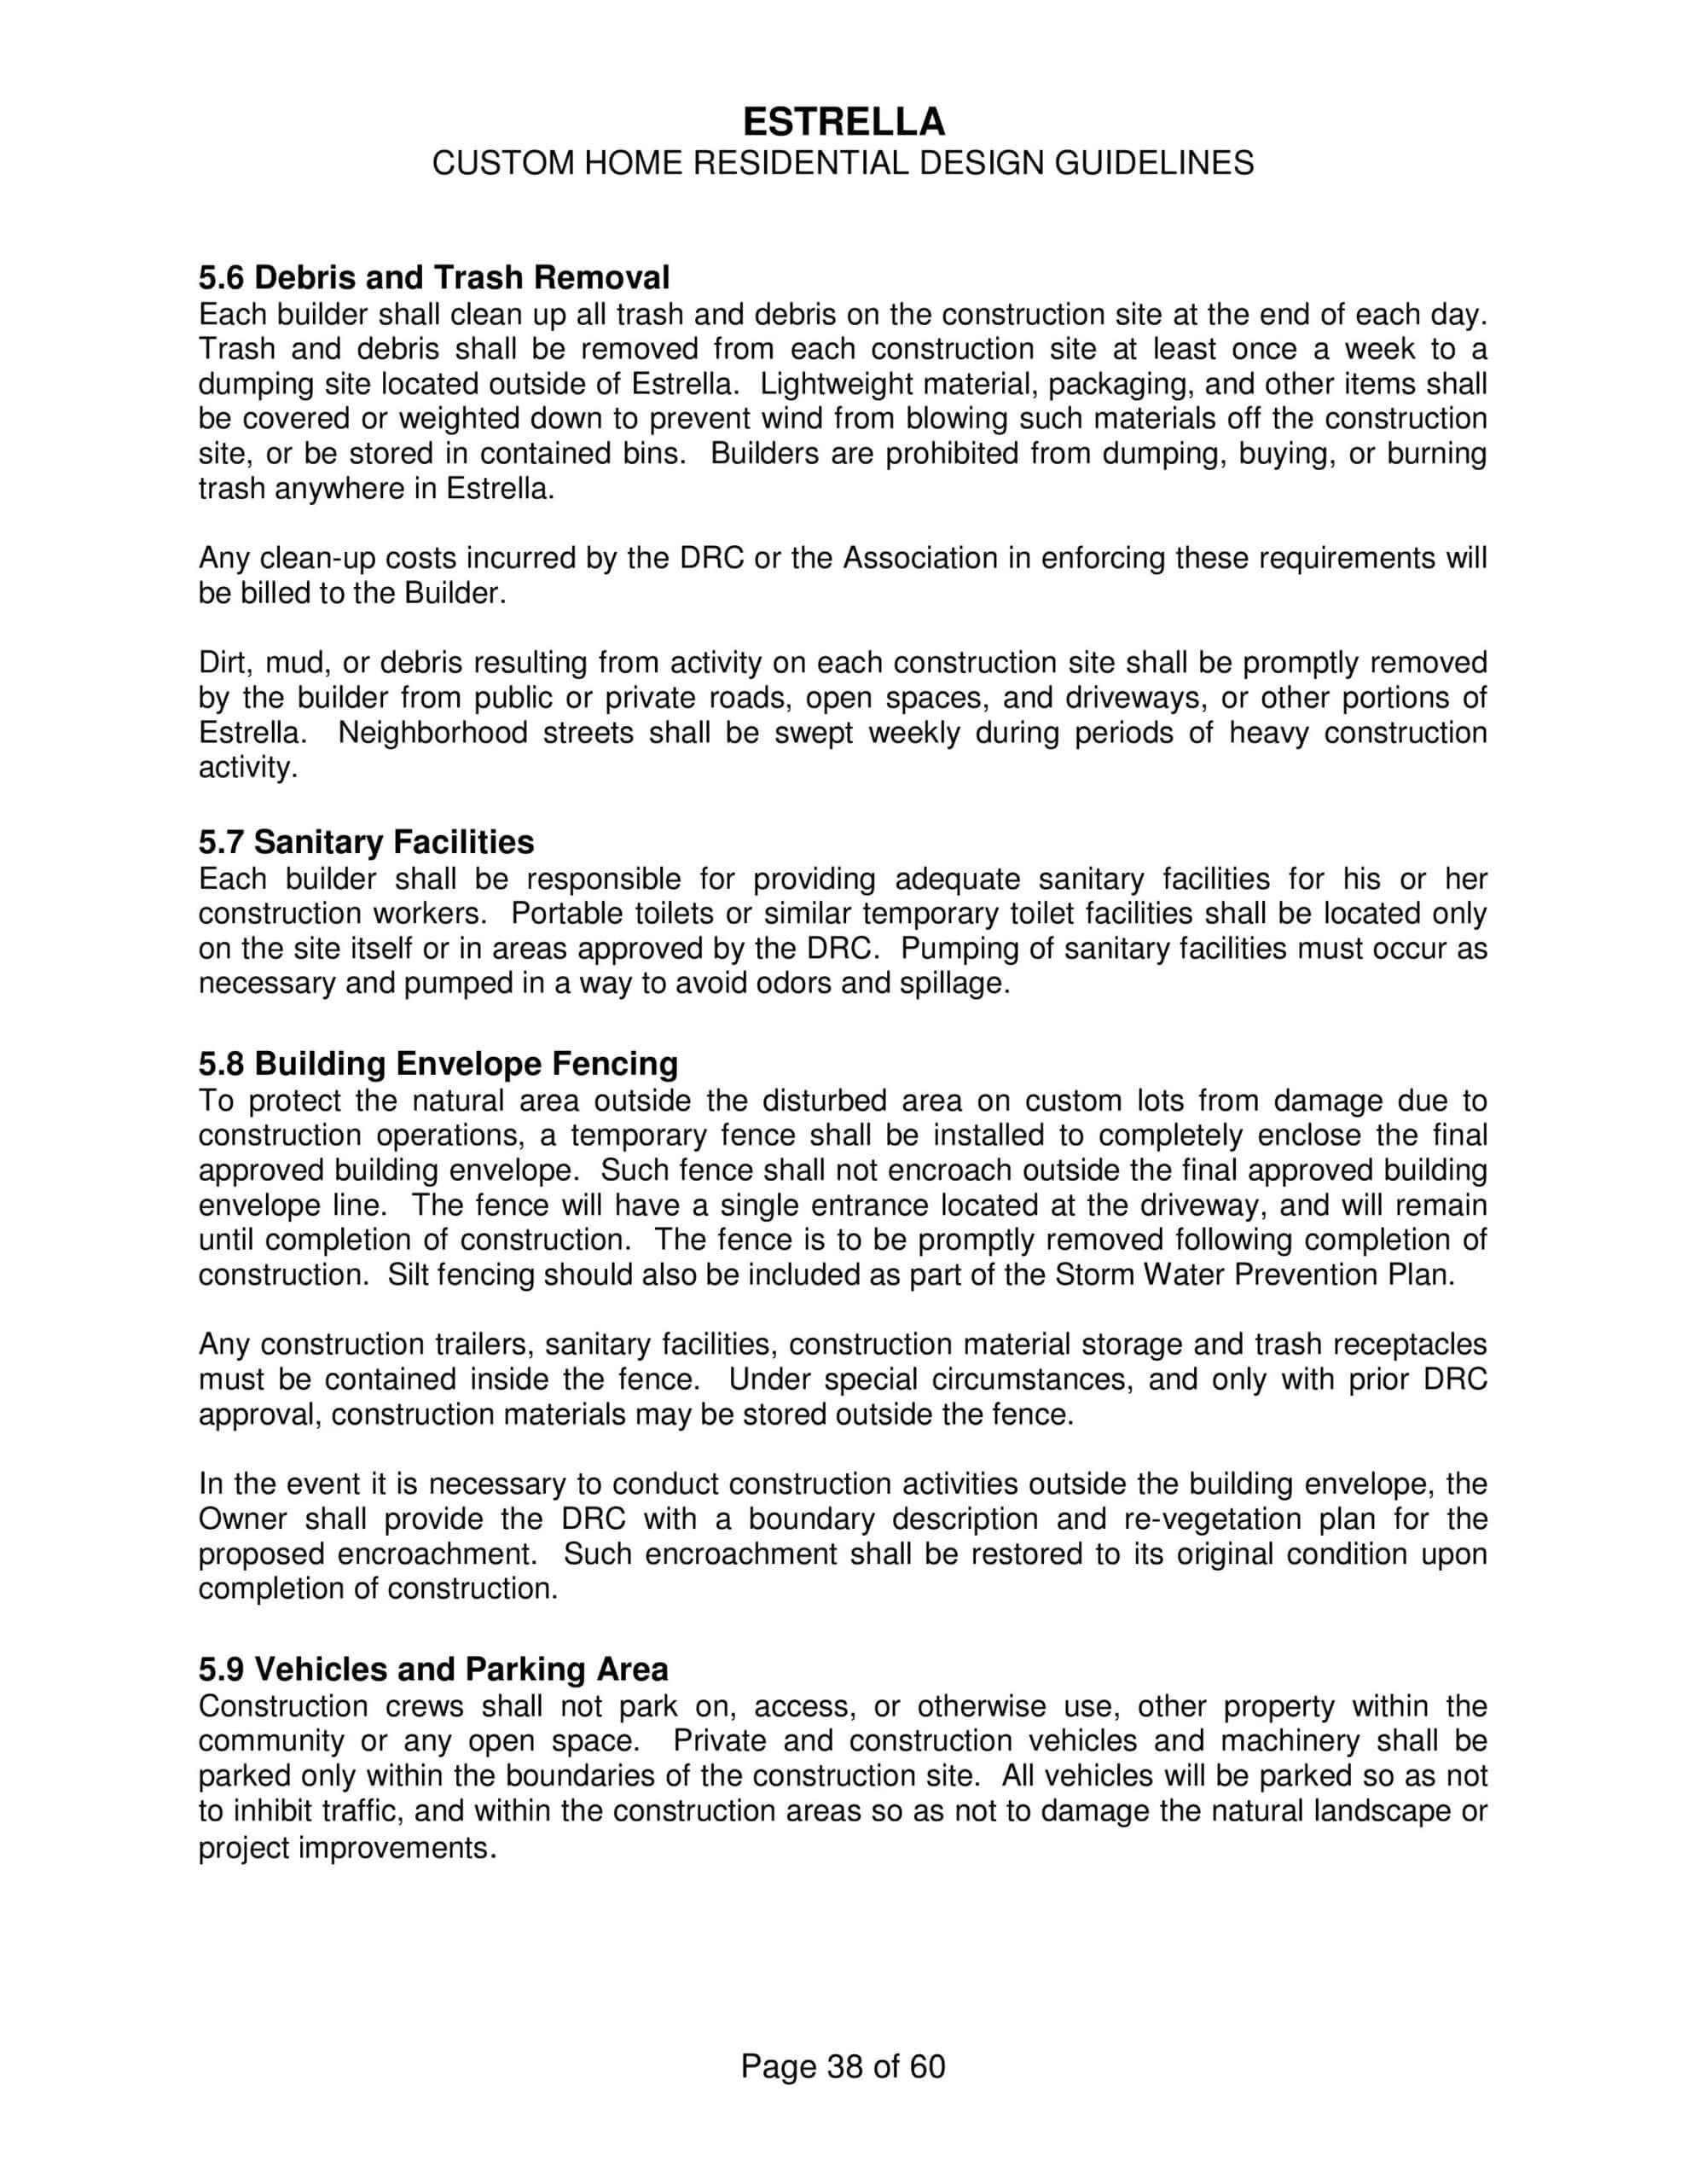 ESTRELLA MOUNTAIN CUSTOM HOME GUIDELINES-page-042